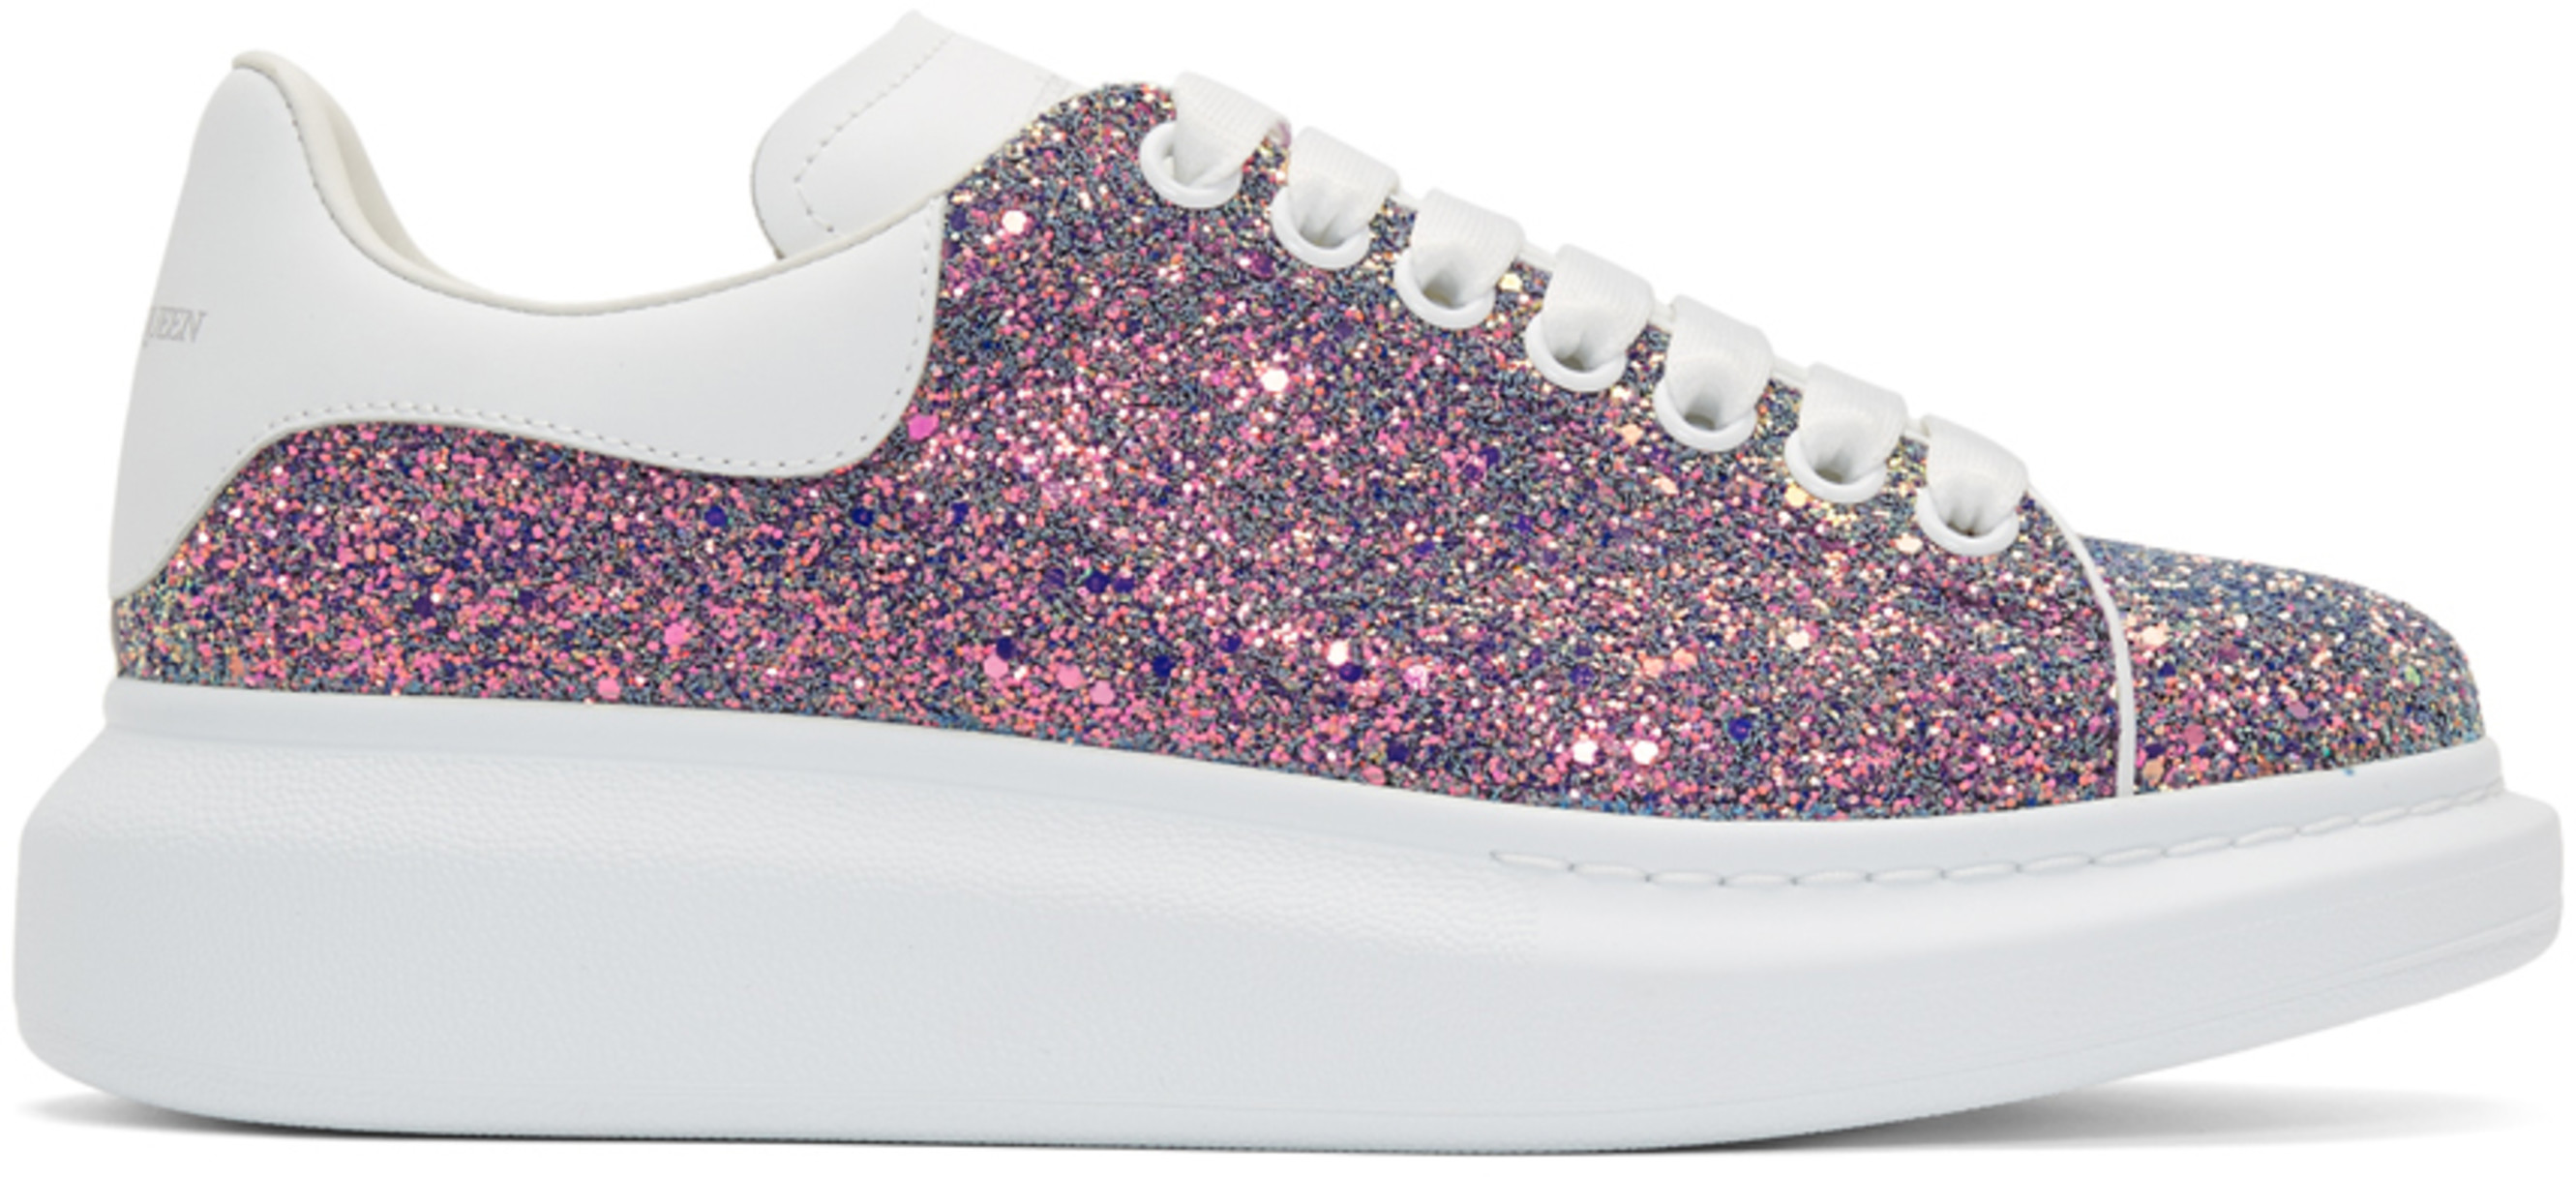 Multicolor Shell Glitter Oversized Sneakers